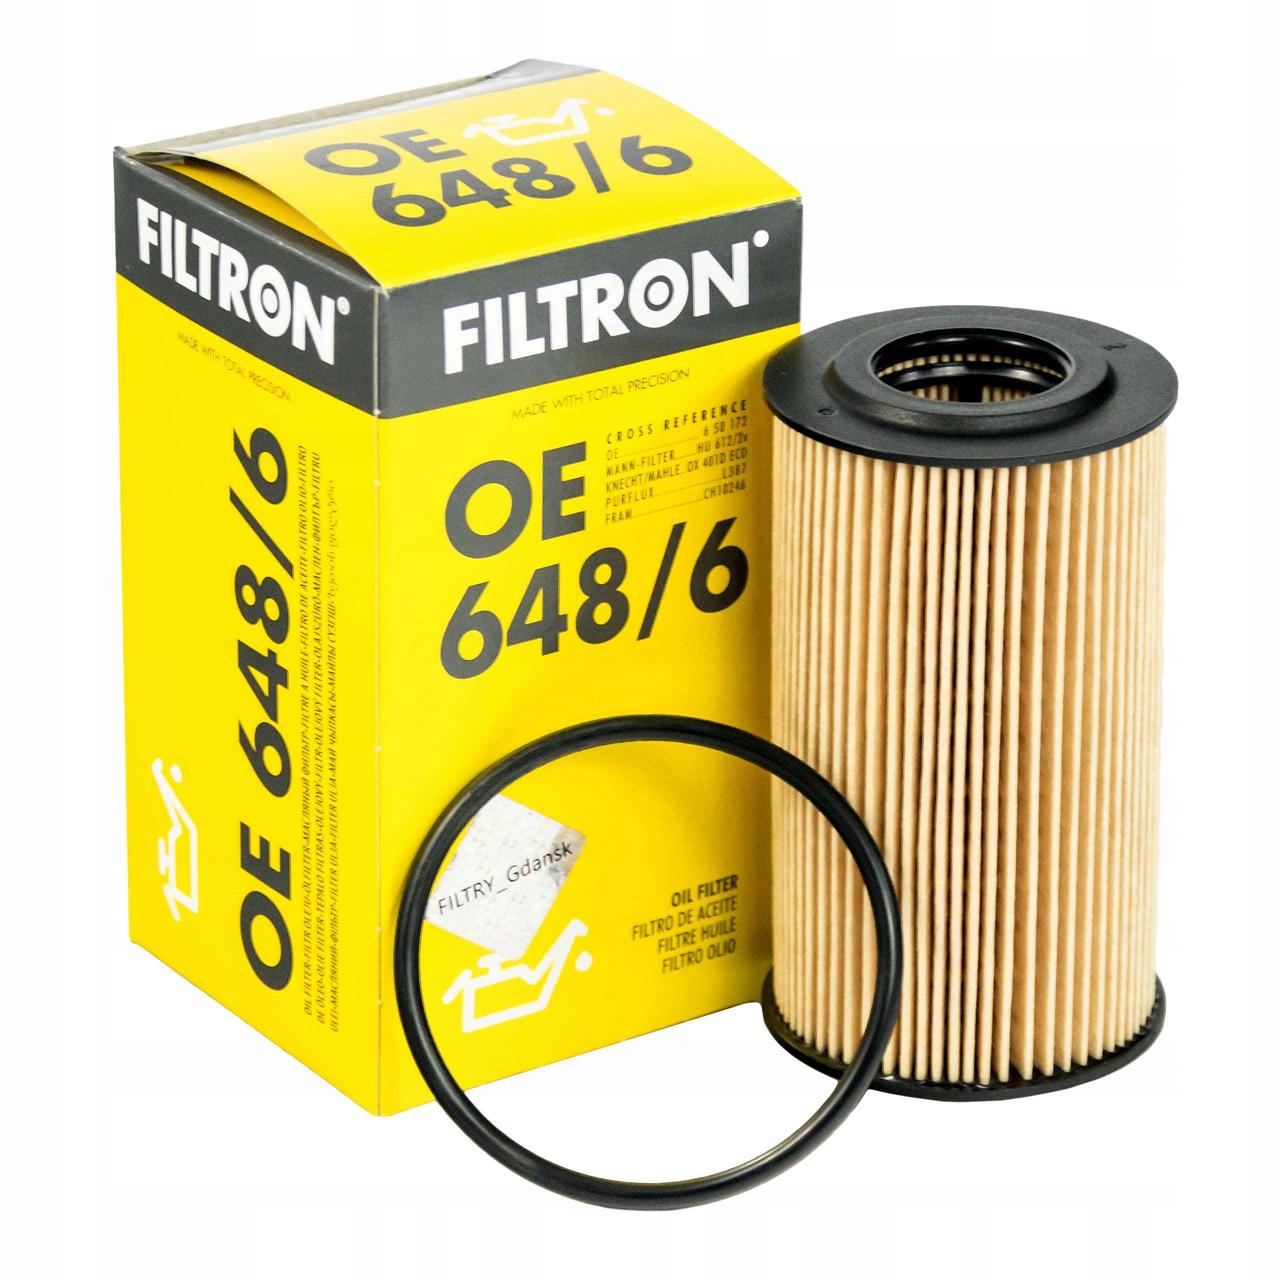 Opel Corsa E 1.2 - 1.4 Yağ Filtresi Filtron